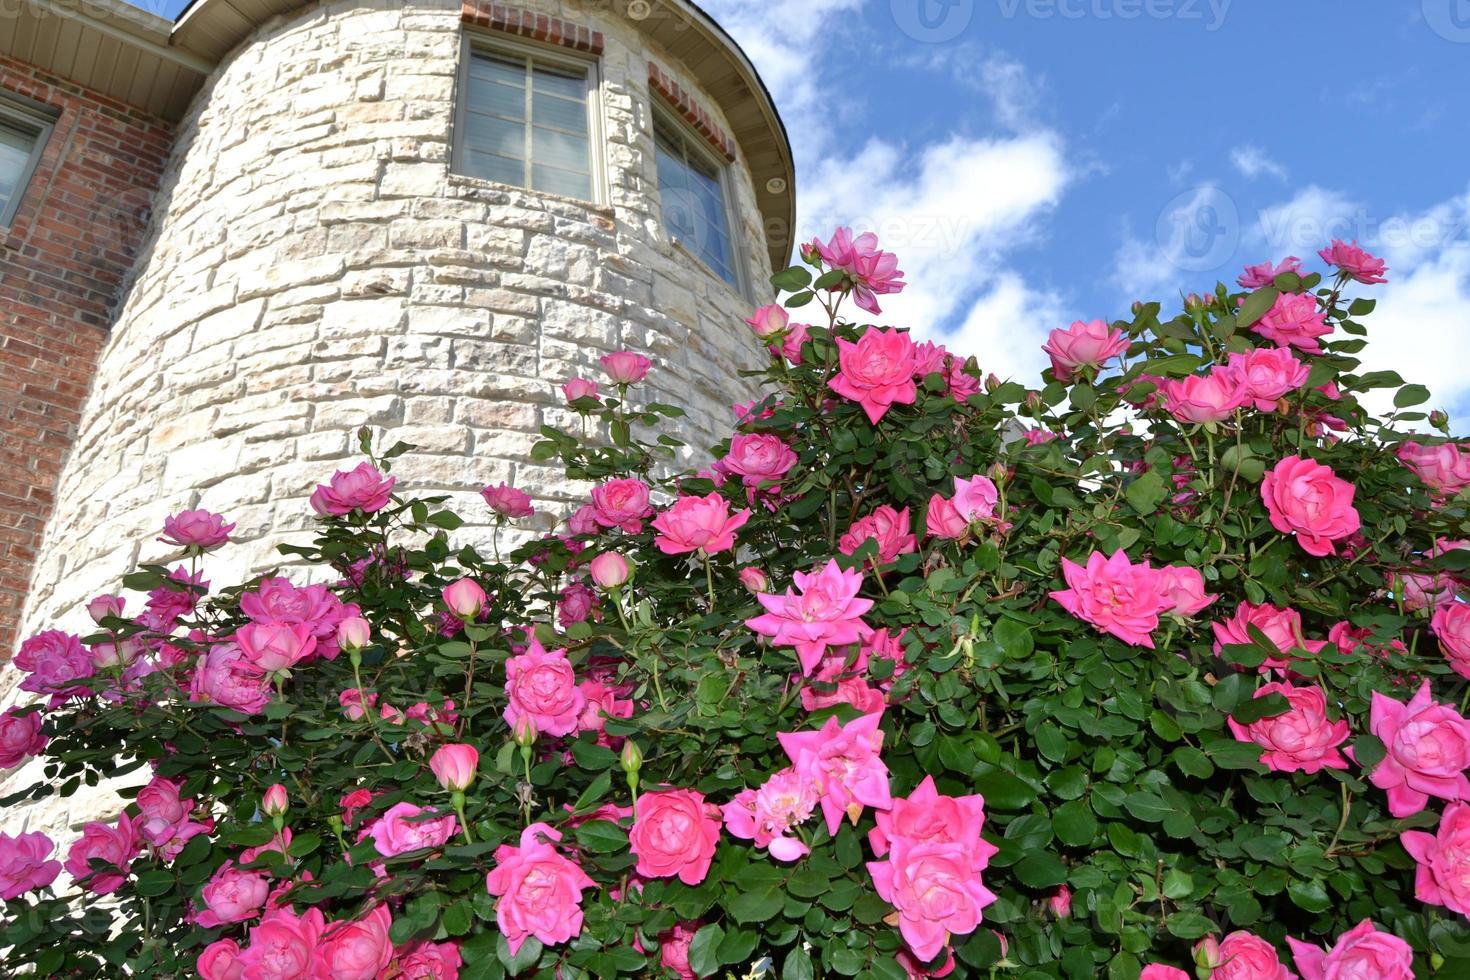 château rosé photo